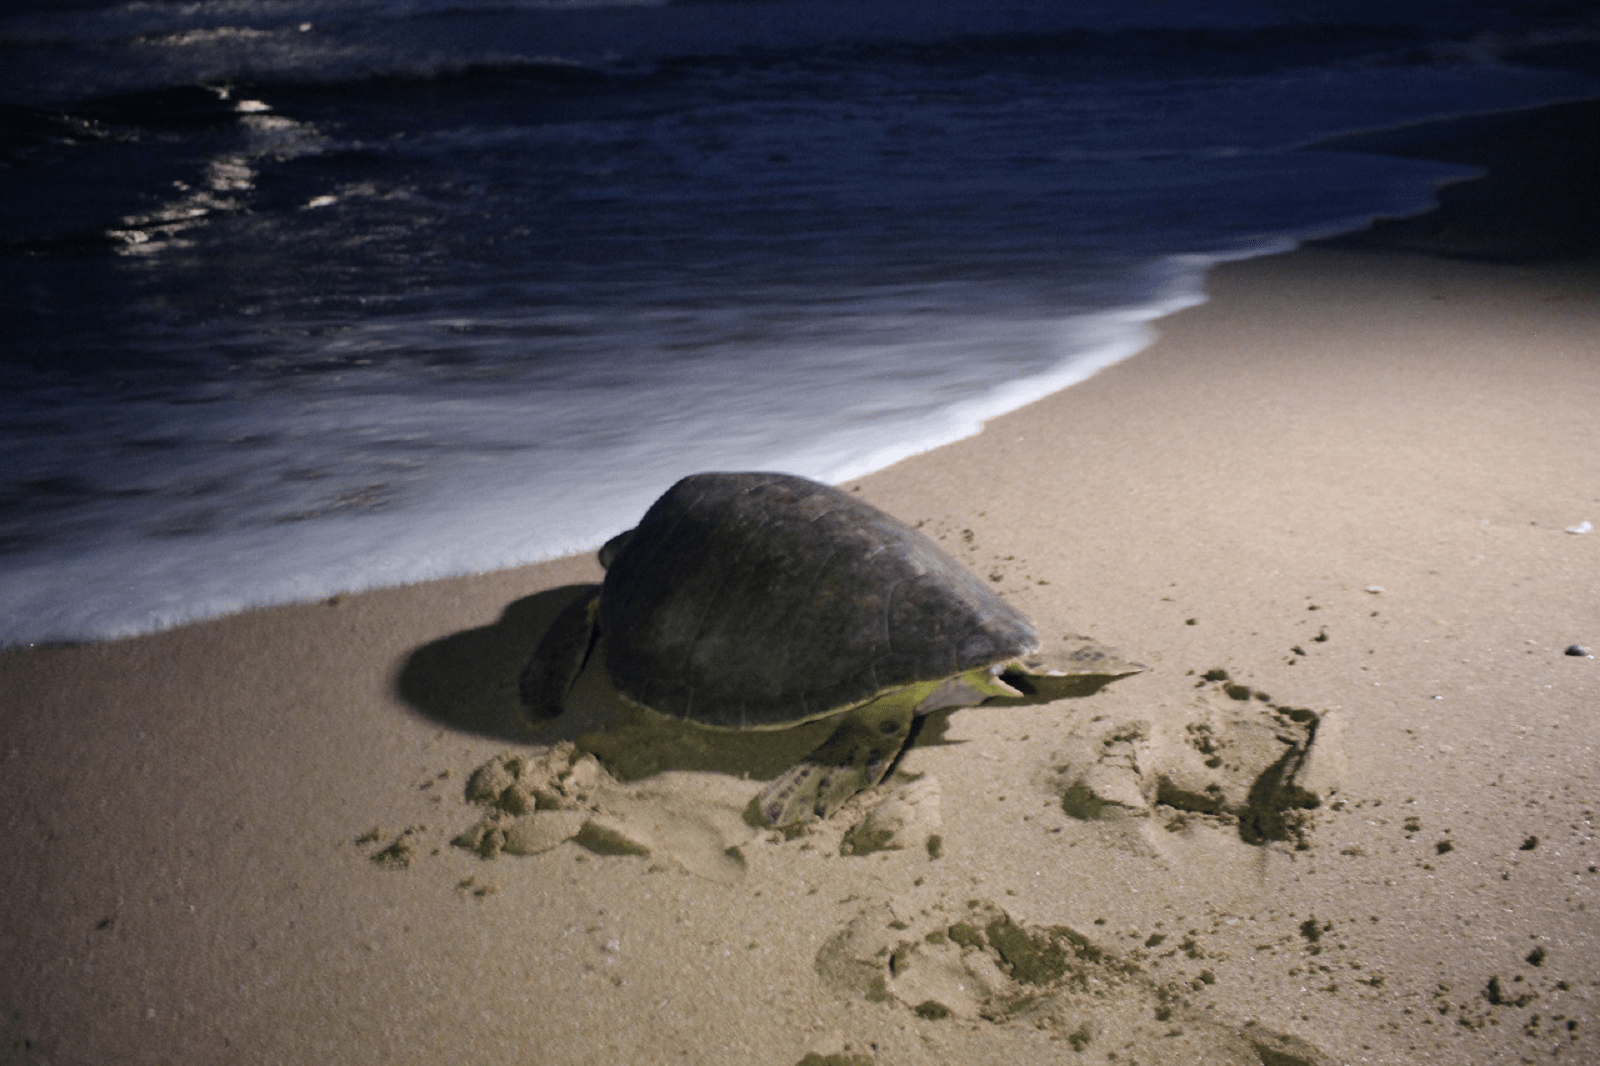 discover troncones saladita majahua mexico playa reservaciones hospedaje ixtapa guerrero travel near me booking hotel cheap hotel liberacion de tortugas turtle release tortuga prieta Brown turtle